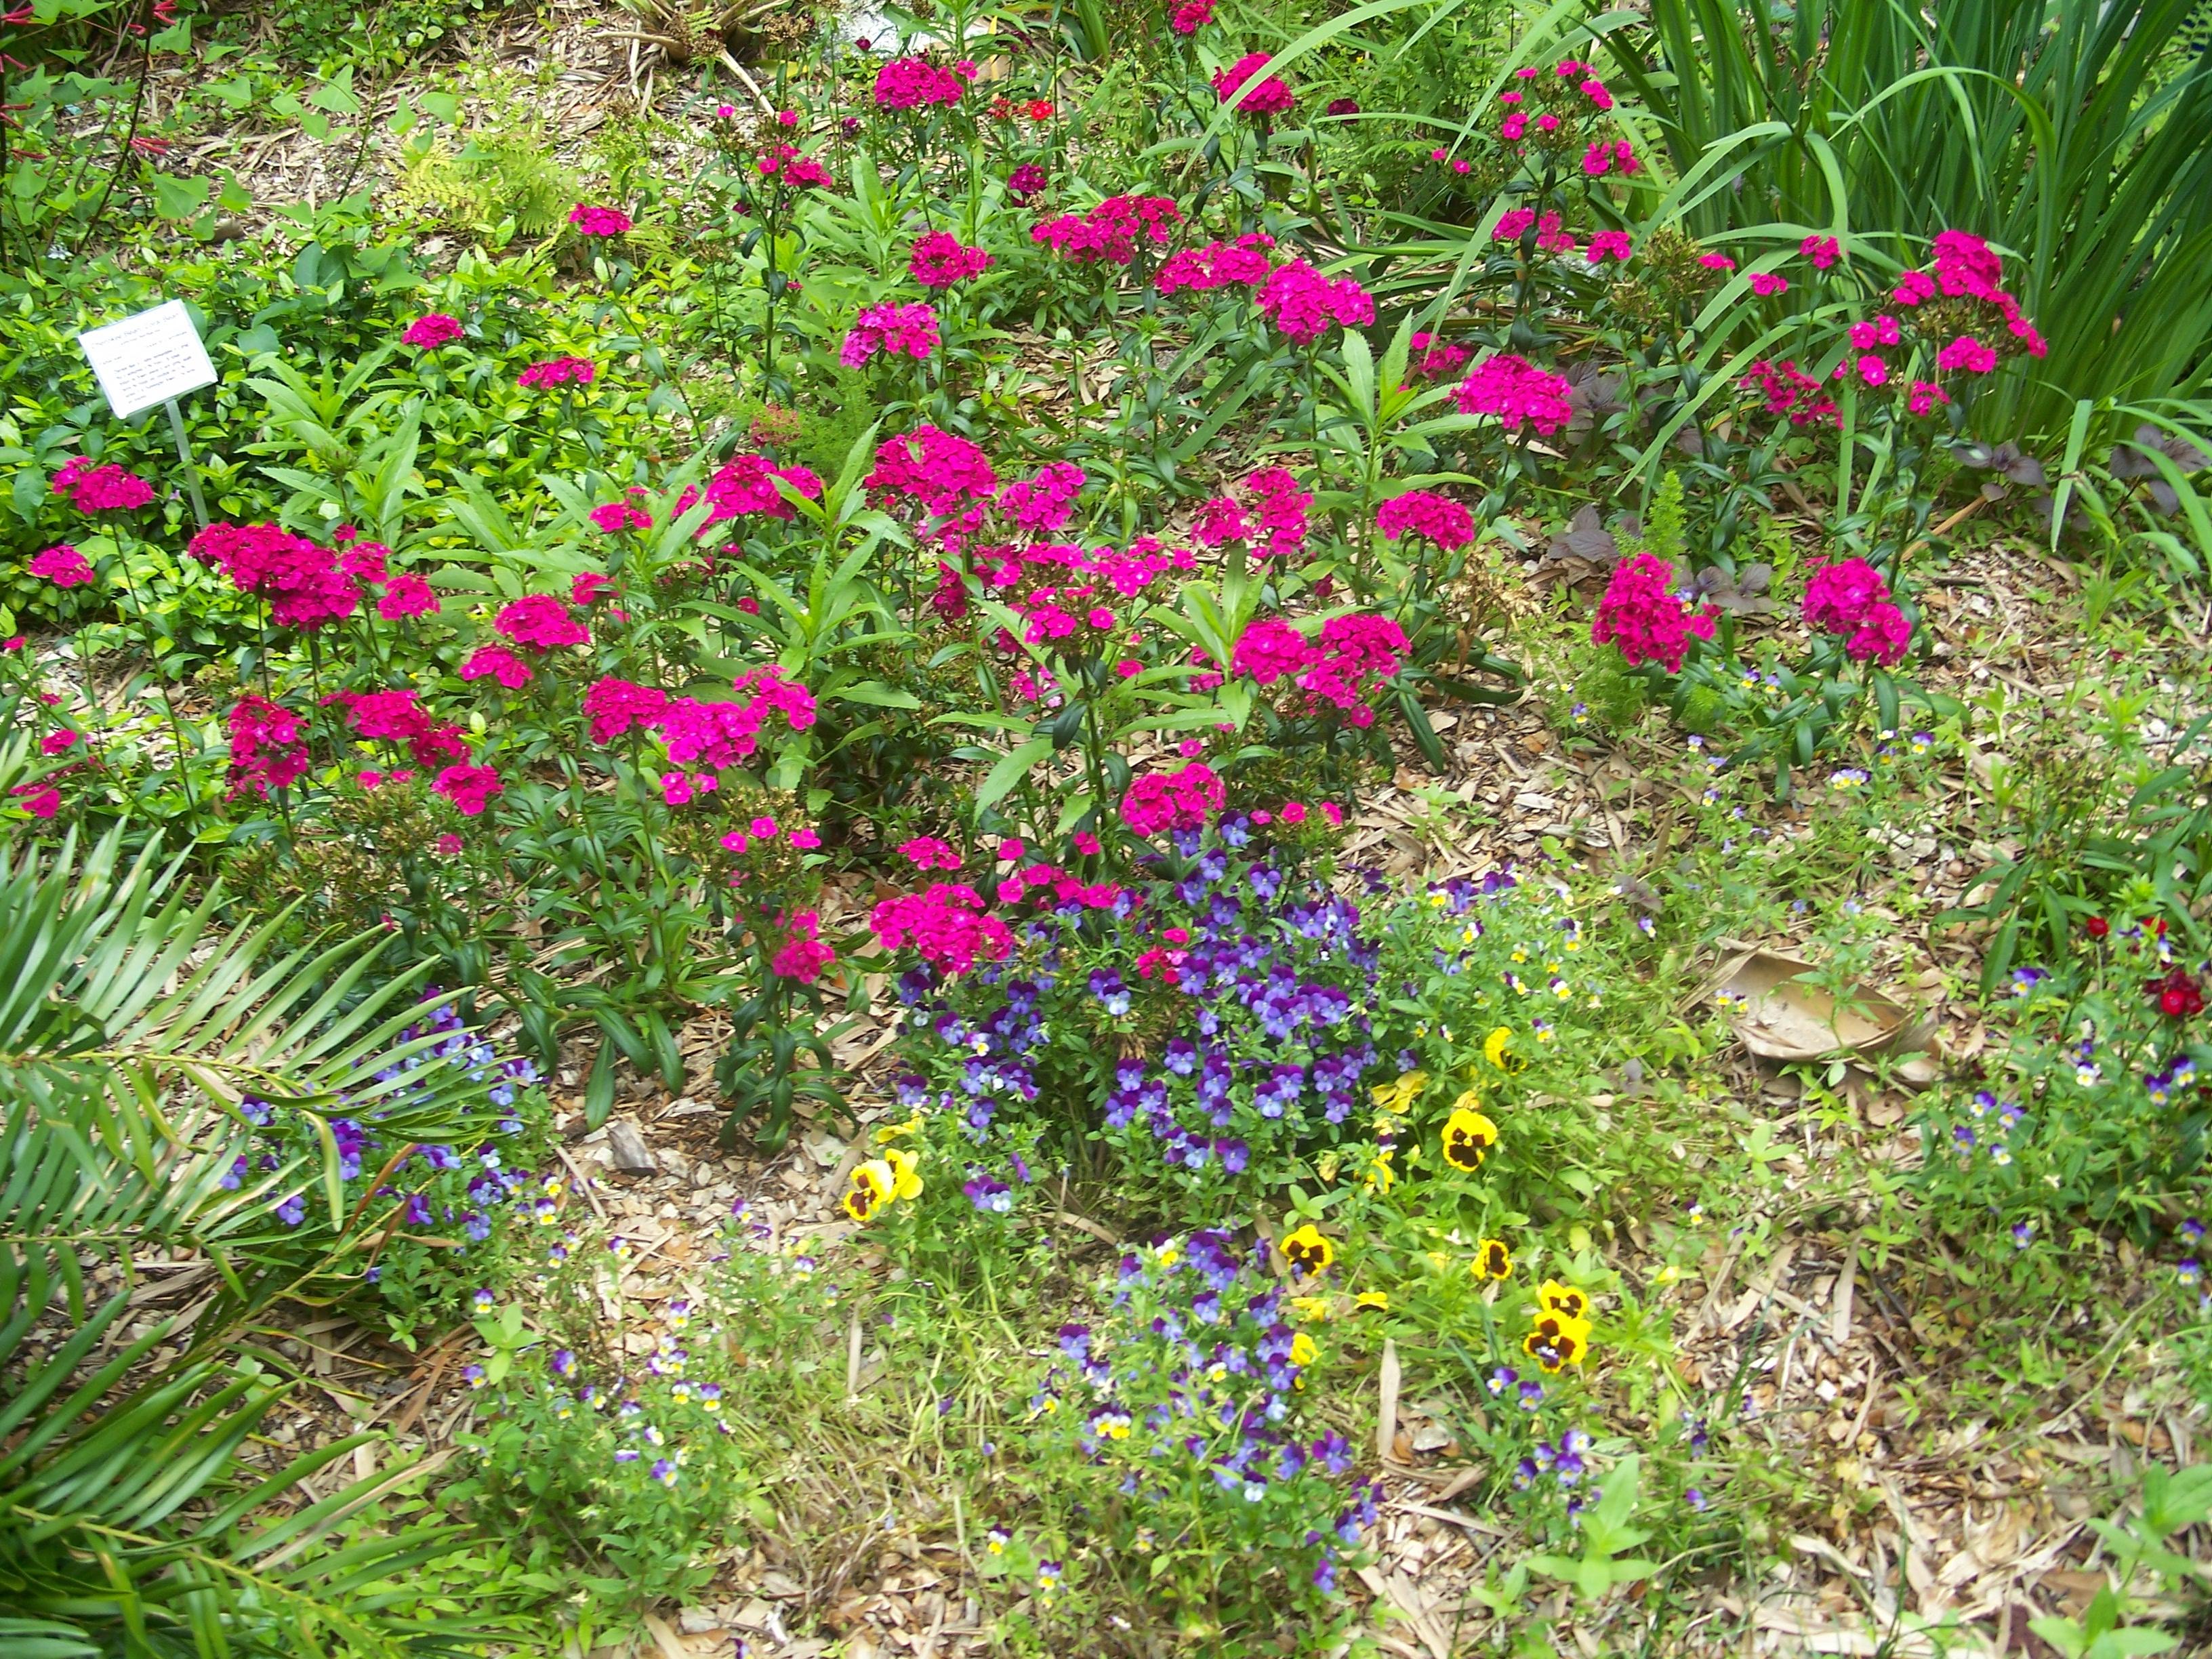 File:Gainesville FL Kanapaha Botanical Gardens Flowers01